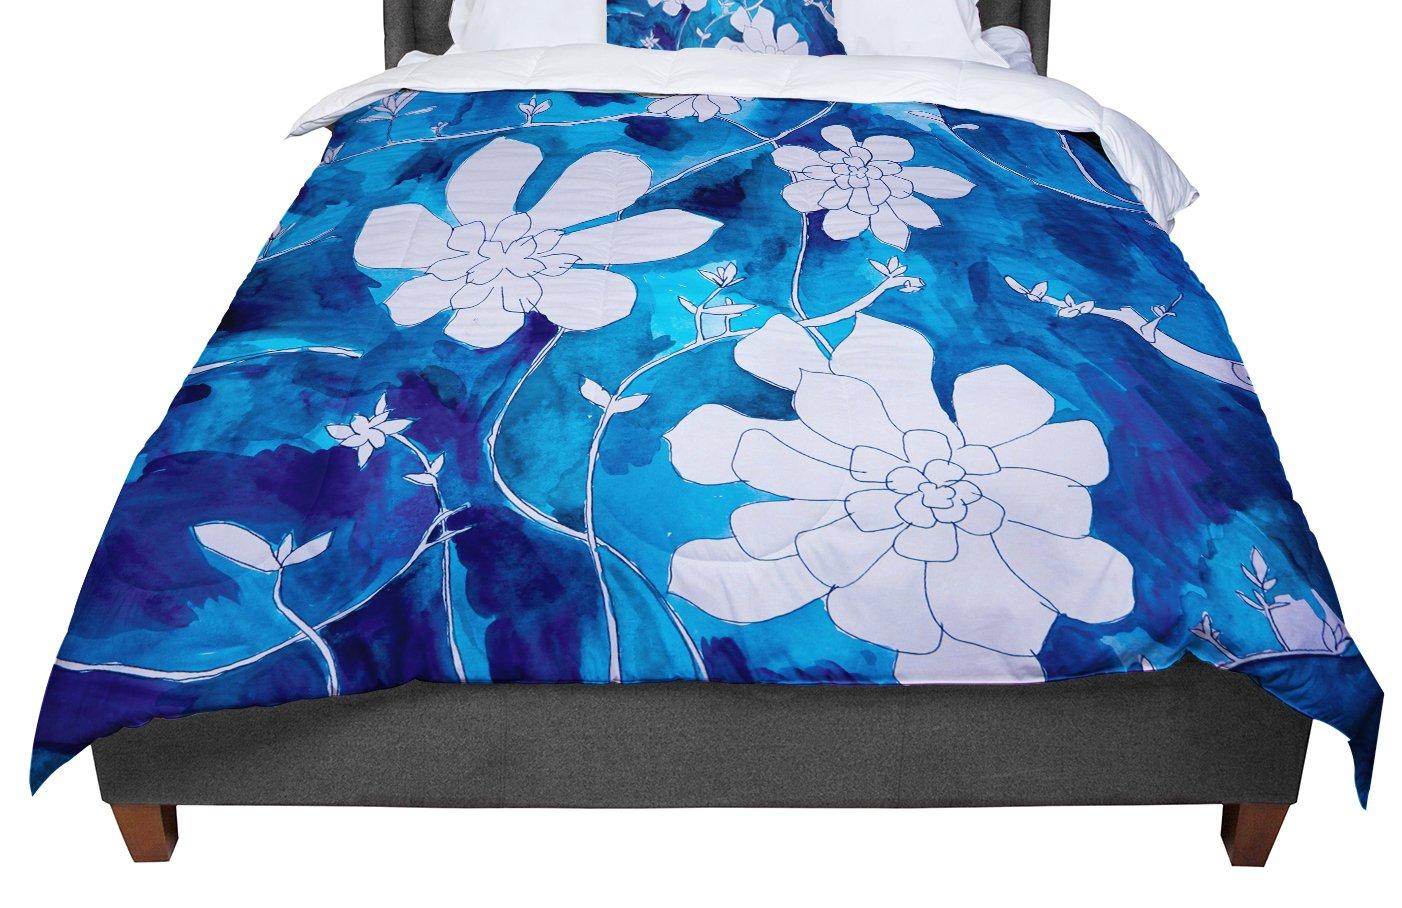 KESS InHouse Theresa Giolzetti ''Succulent Dance 1'' King / Cal King Comforter, 104'' X 88''